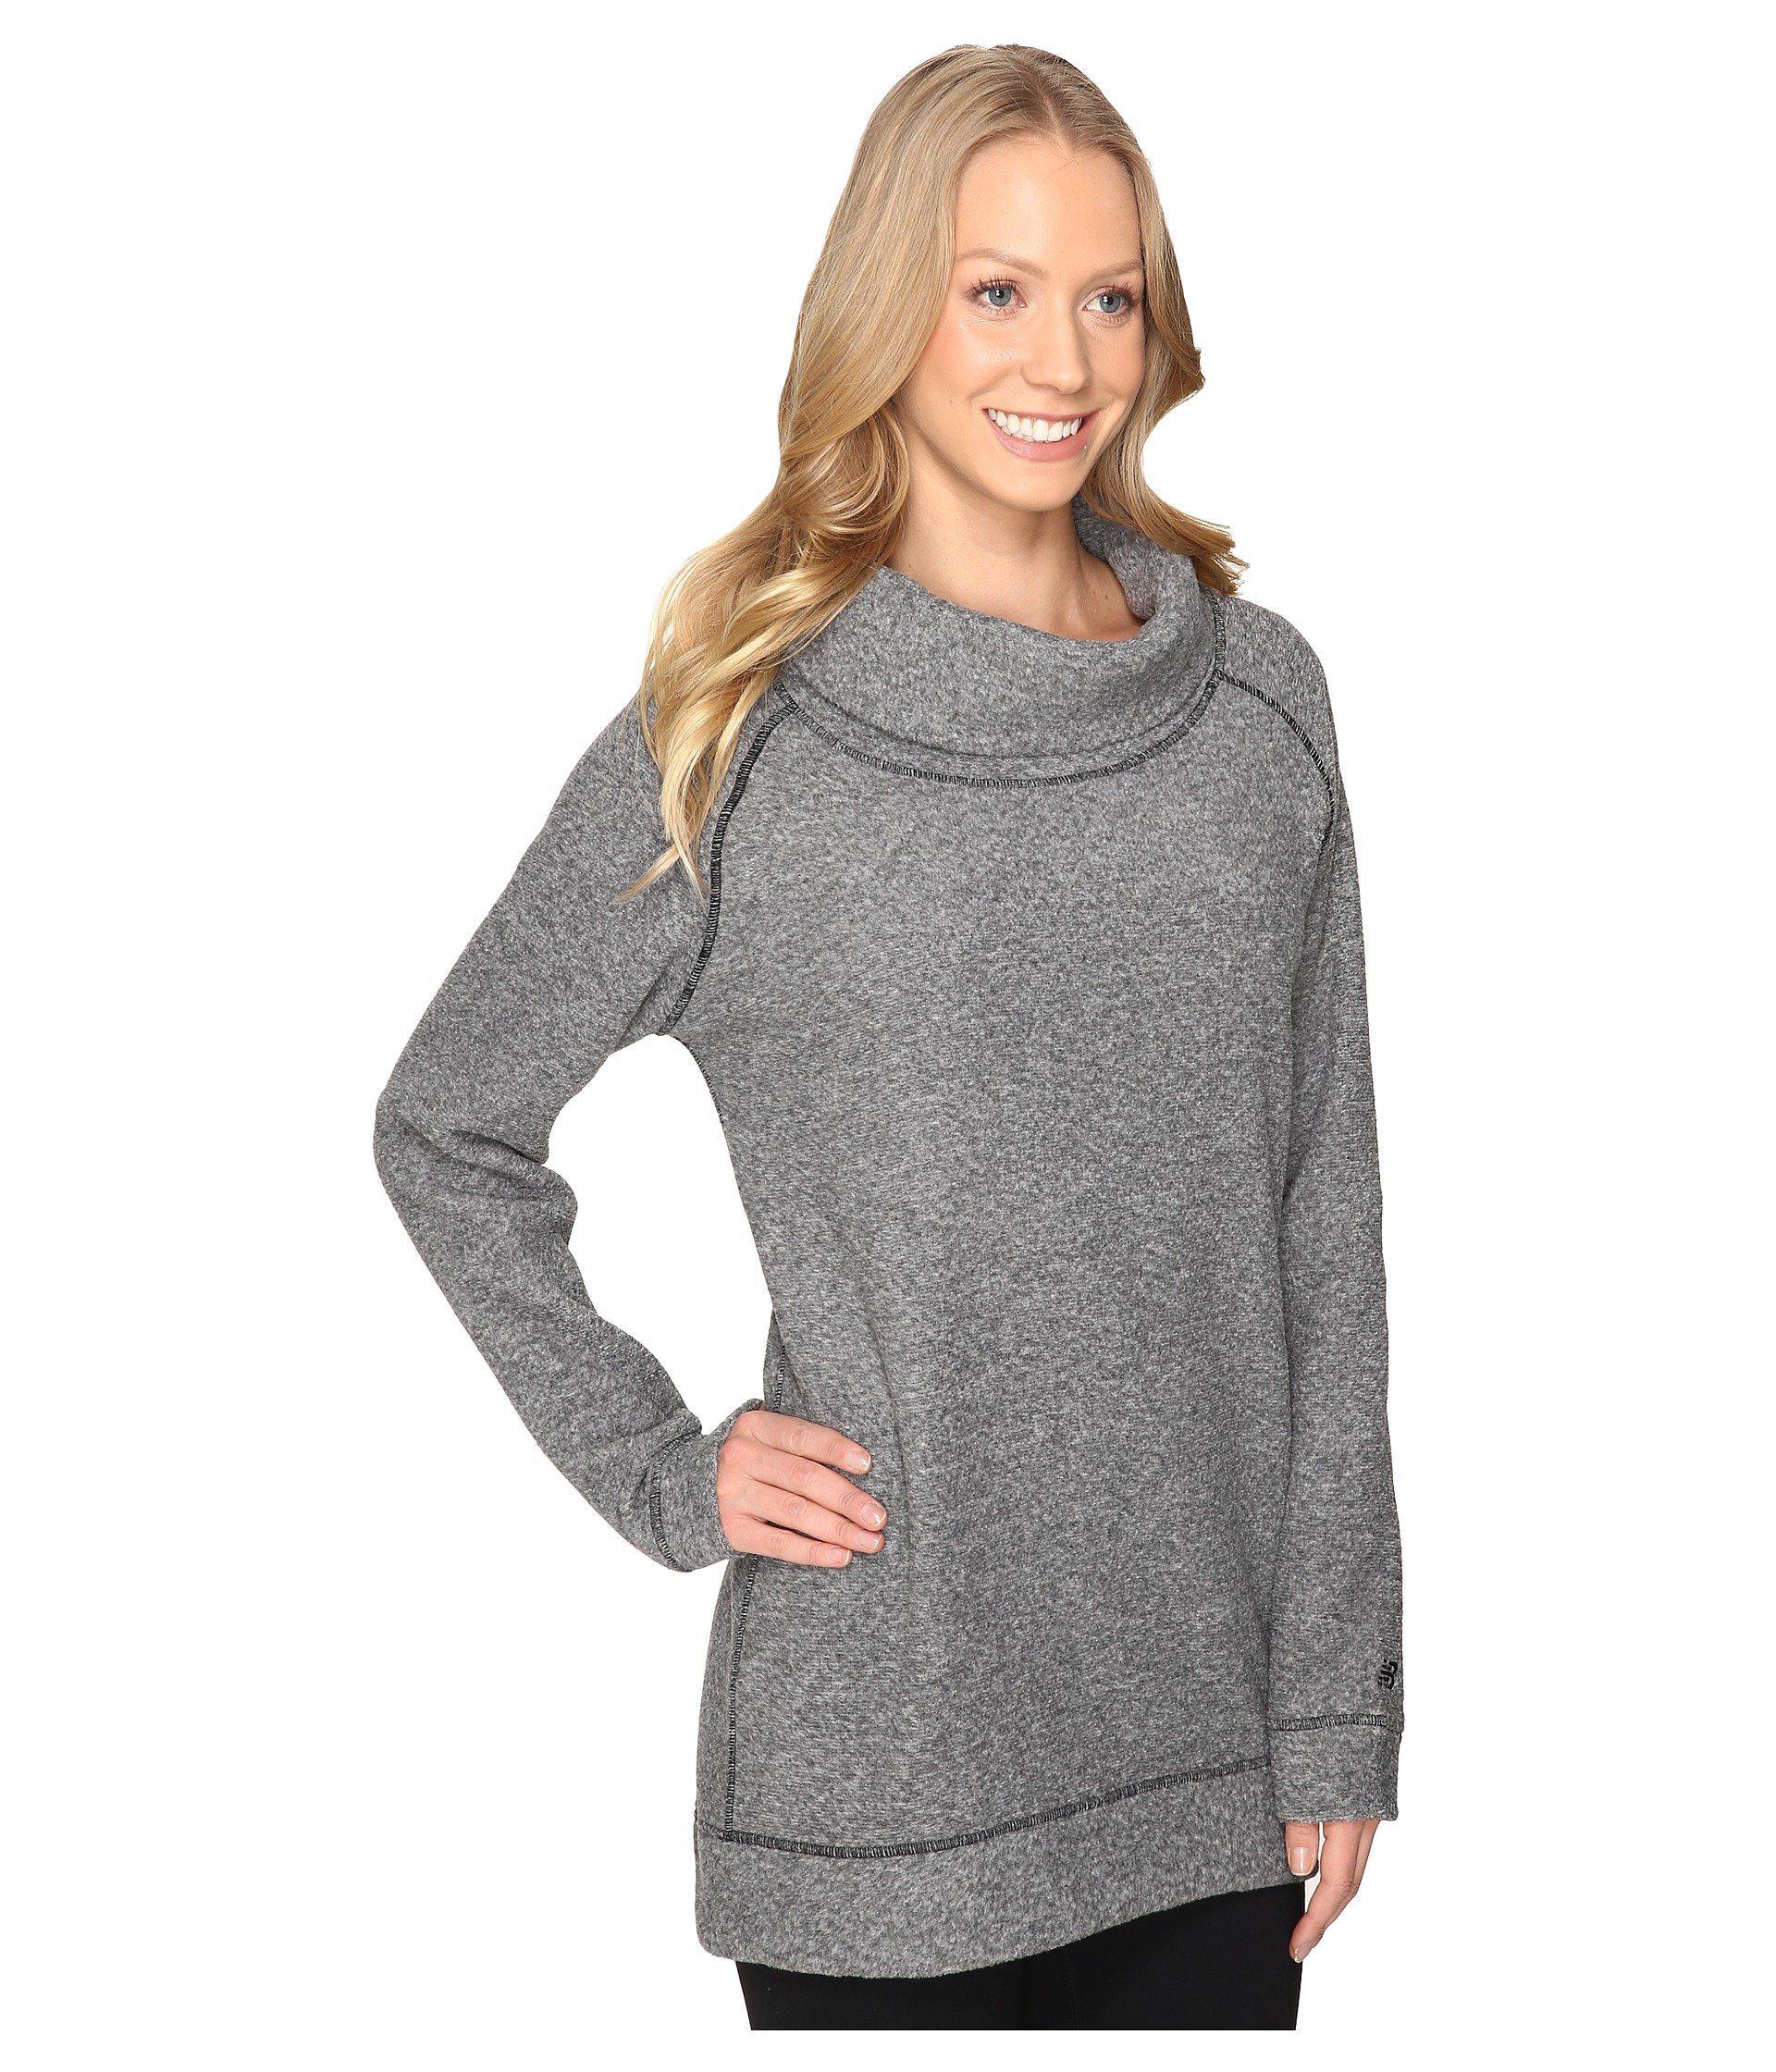 8be16f658f727 New Balance Nb Dry Sweatshirt in Black - Lyst